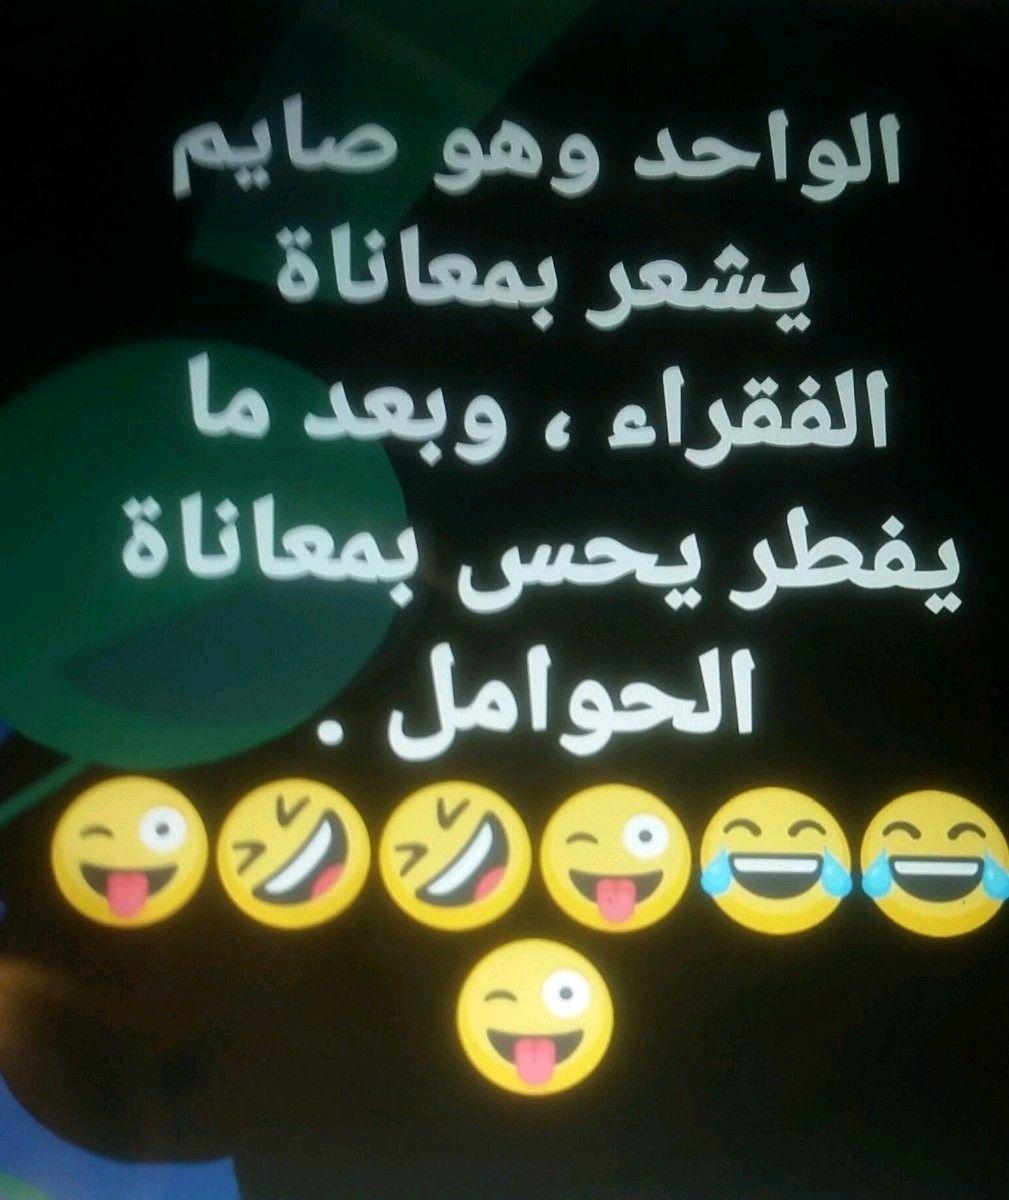 Pin By Hasan Zubi On قطايف رمضانيه منكم واليكم Ramadan Decorations Ramadan Jokes